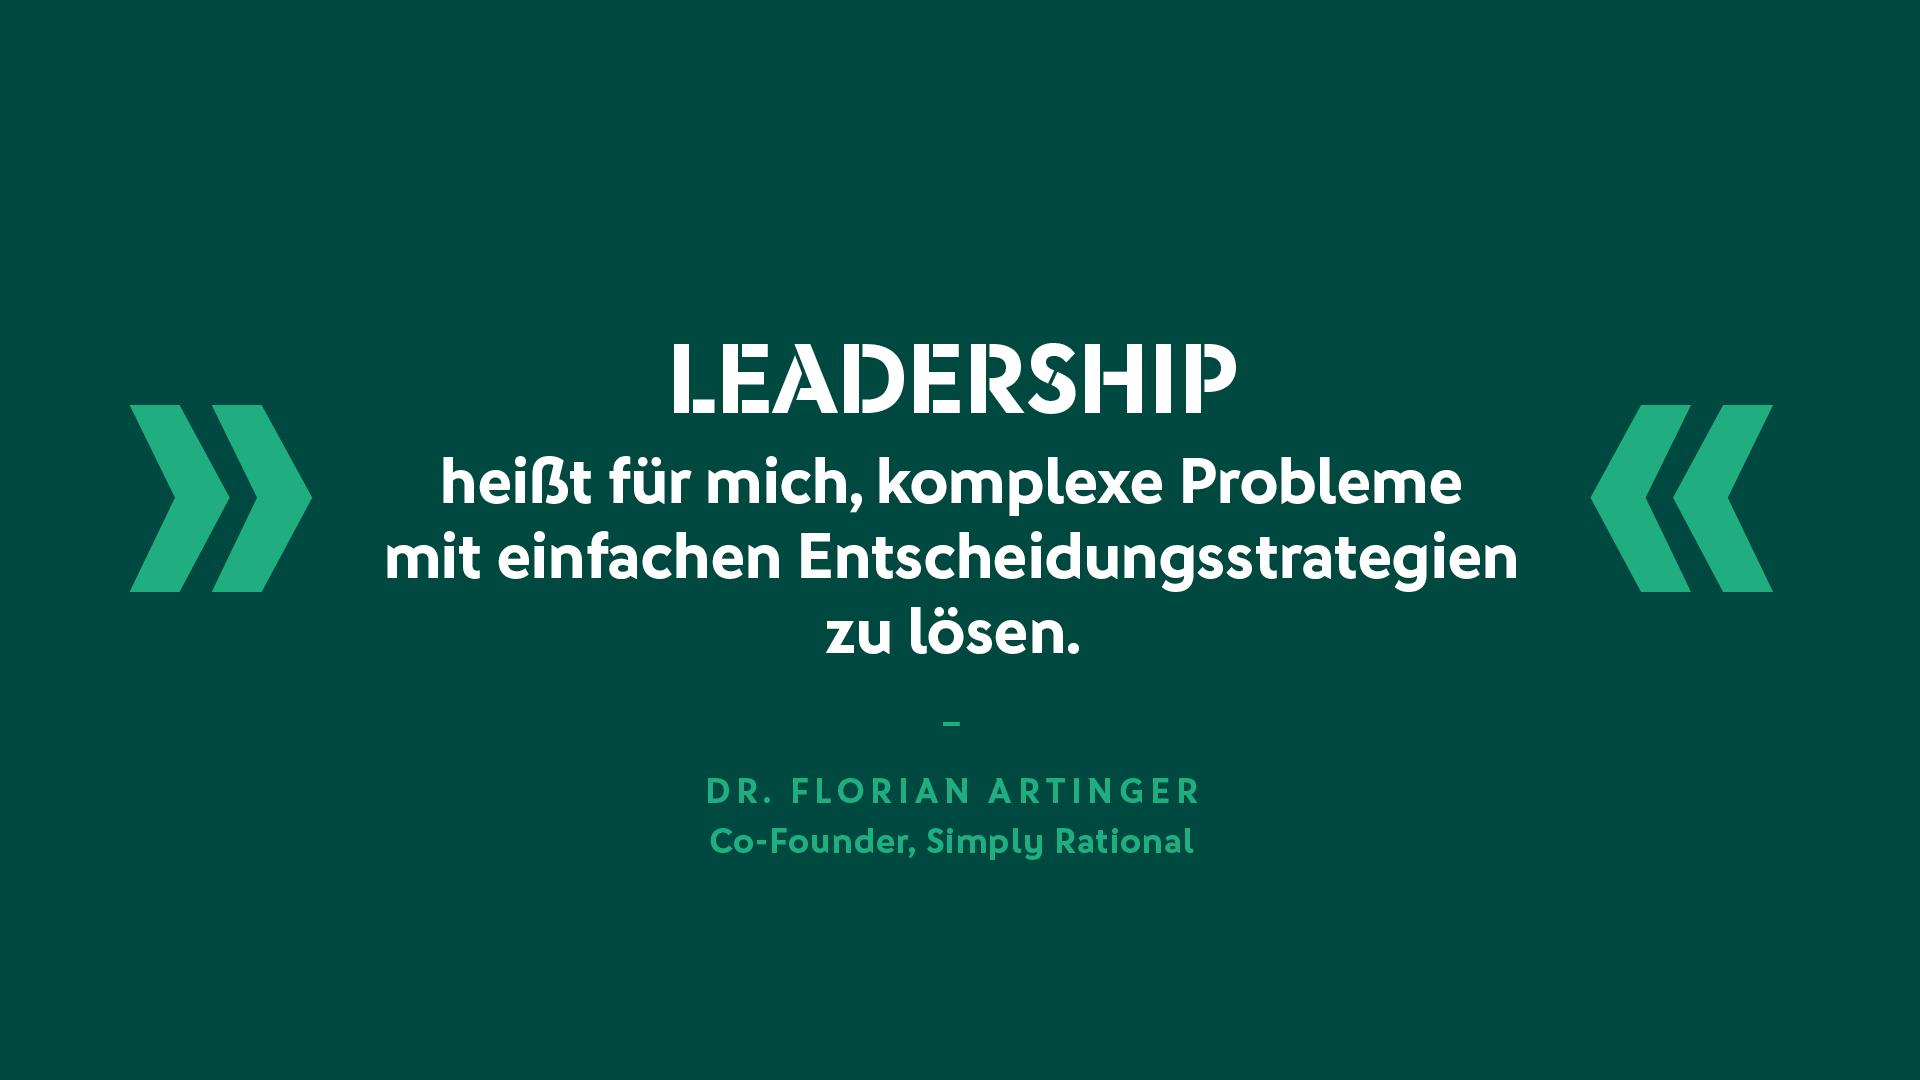 Dr. Florian Artinger